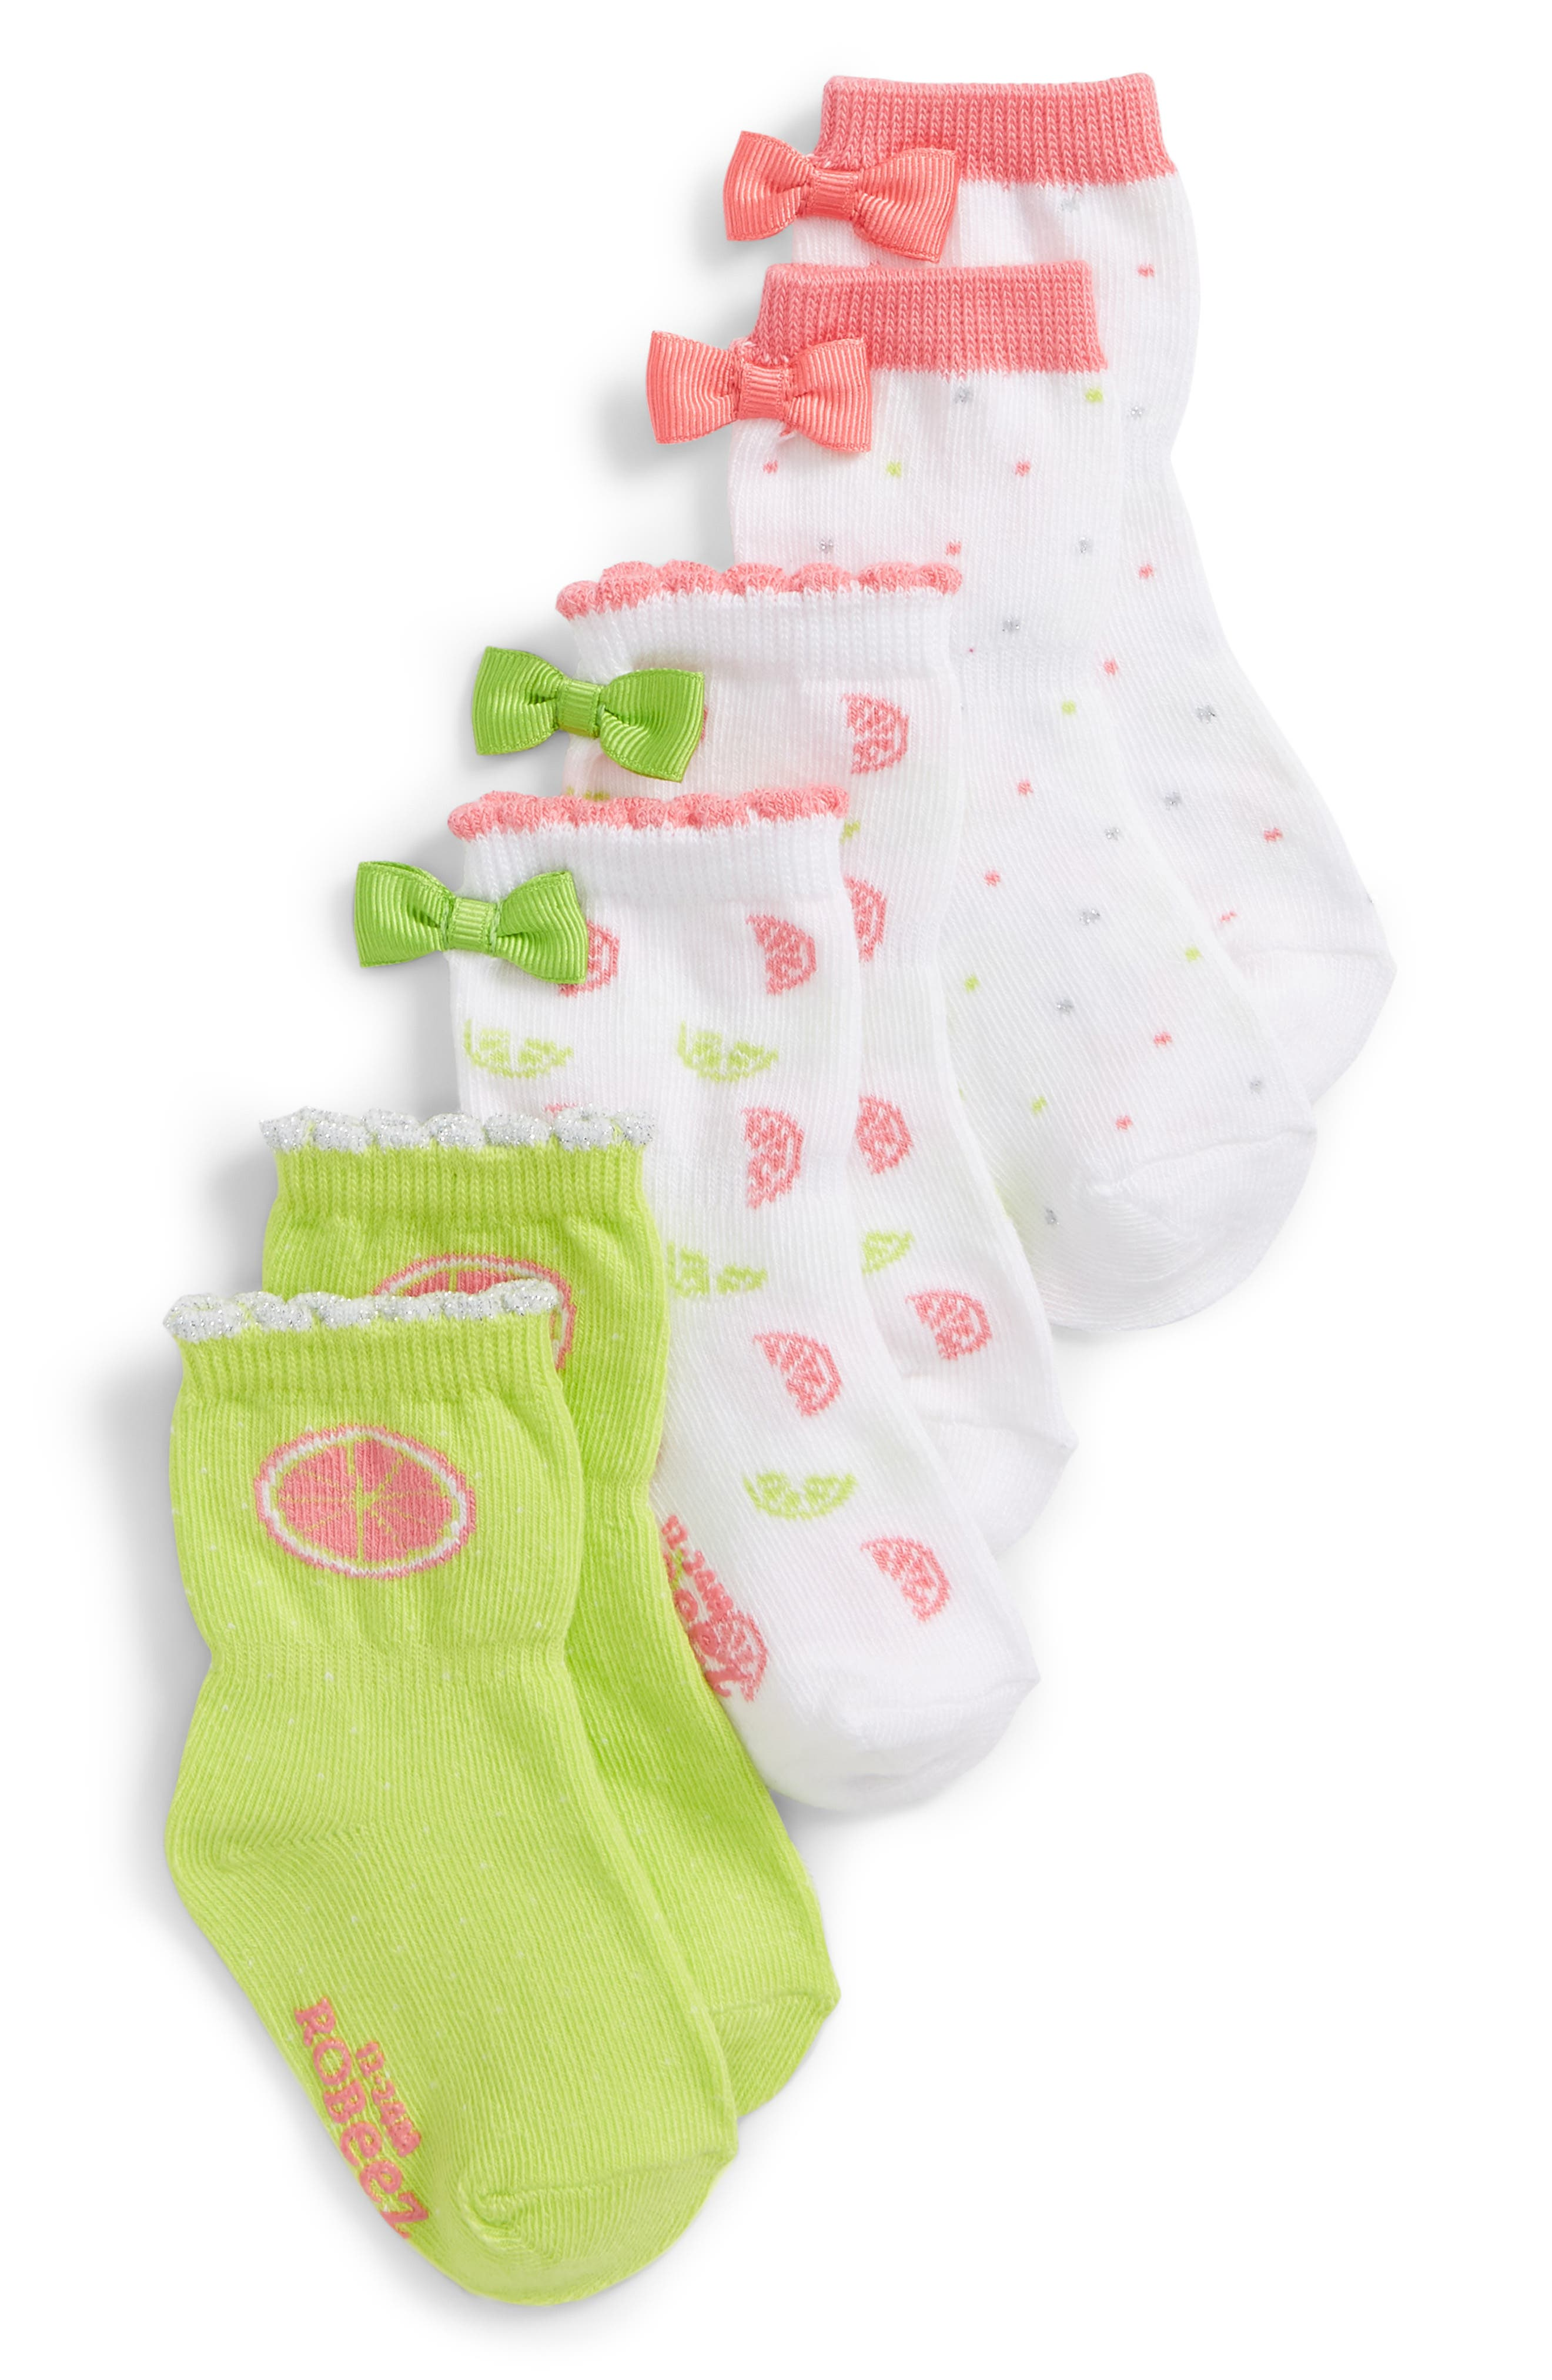 Citrus 3-Pack Socks,                         Main,                         color, Citron/ Pink/ White